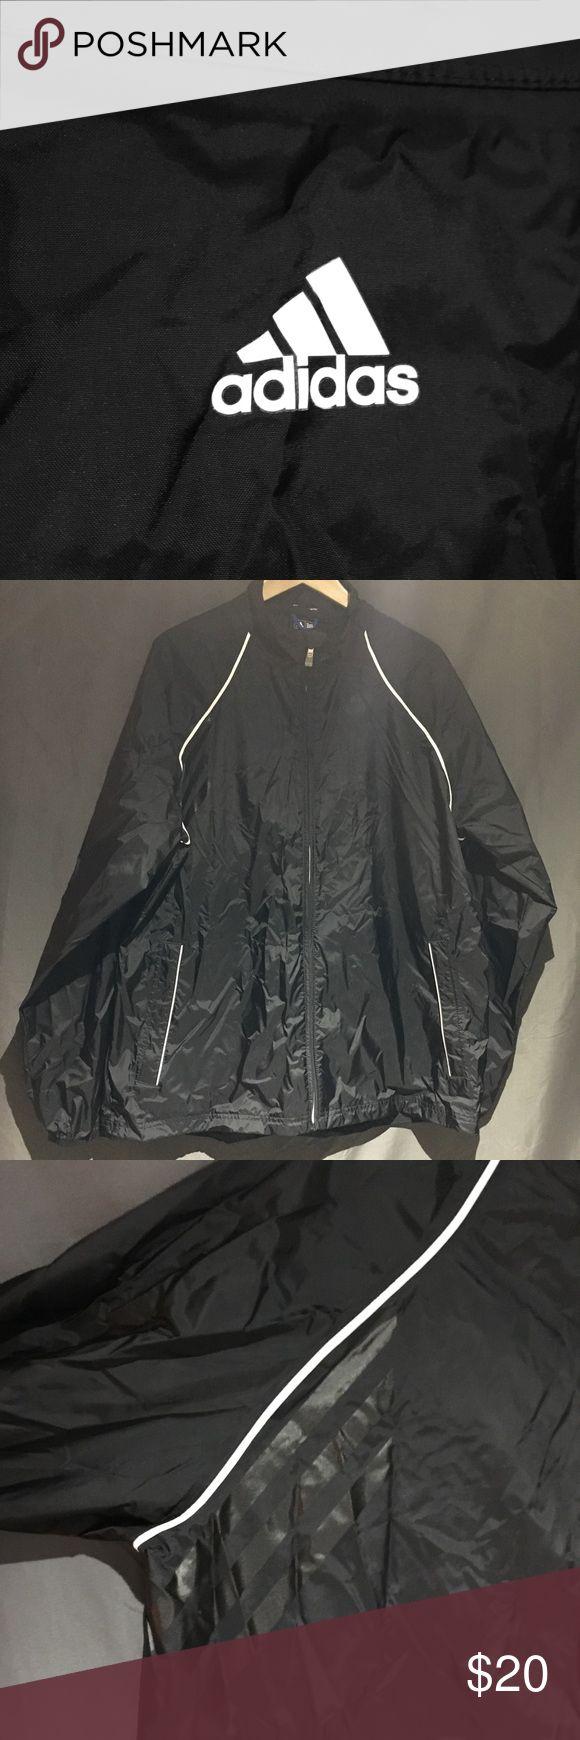 Adidas ClimaProof Rain Jacket Reflective accents on this packable rain jacket. Zippered Pockets, cinch waist, elastic wrist. LIKE NEW adidas Jackets & Coats Raincoats